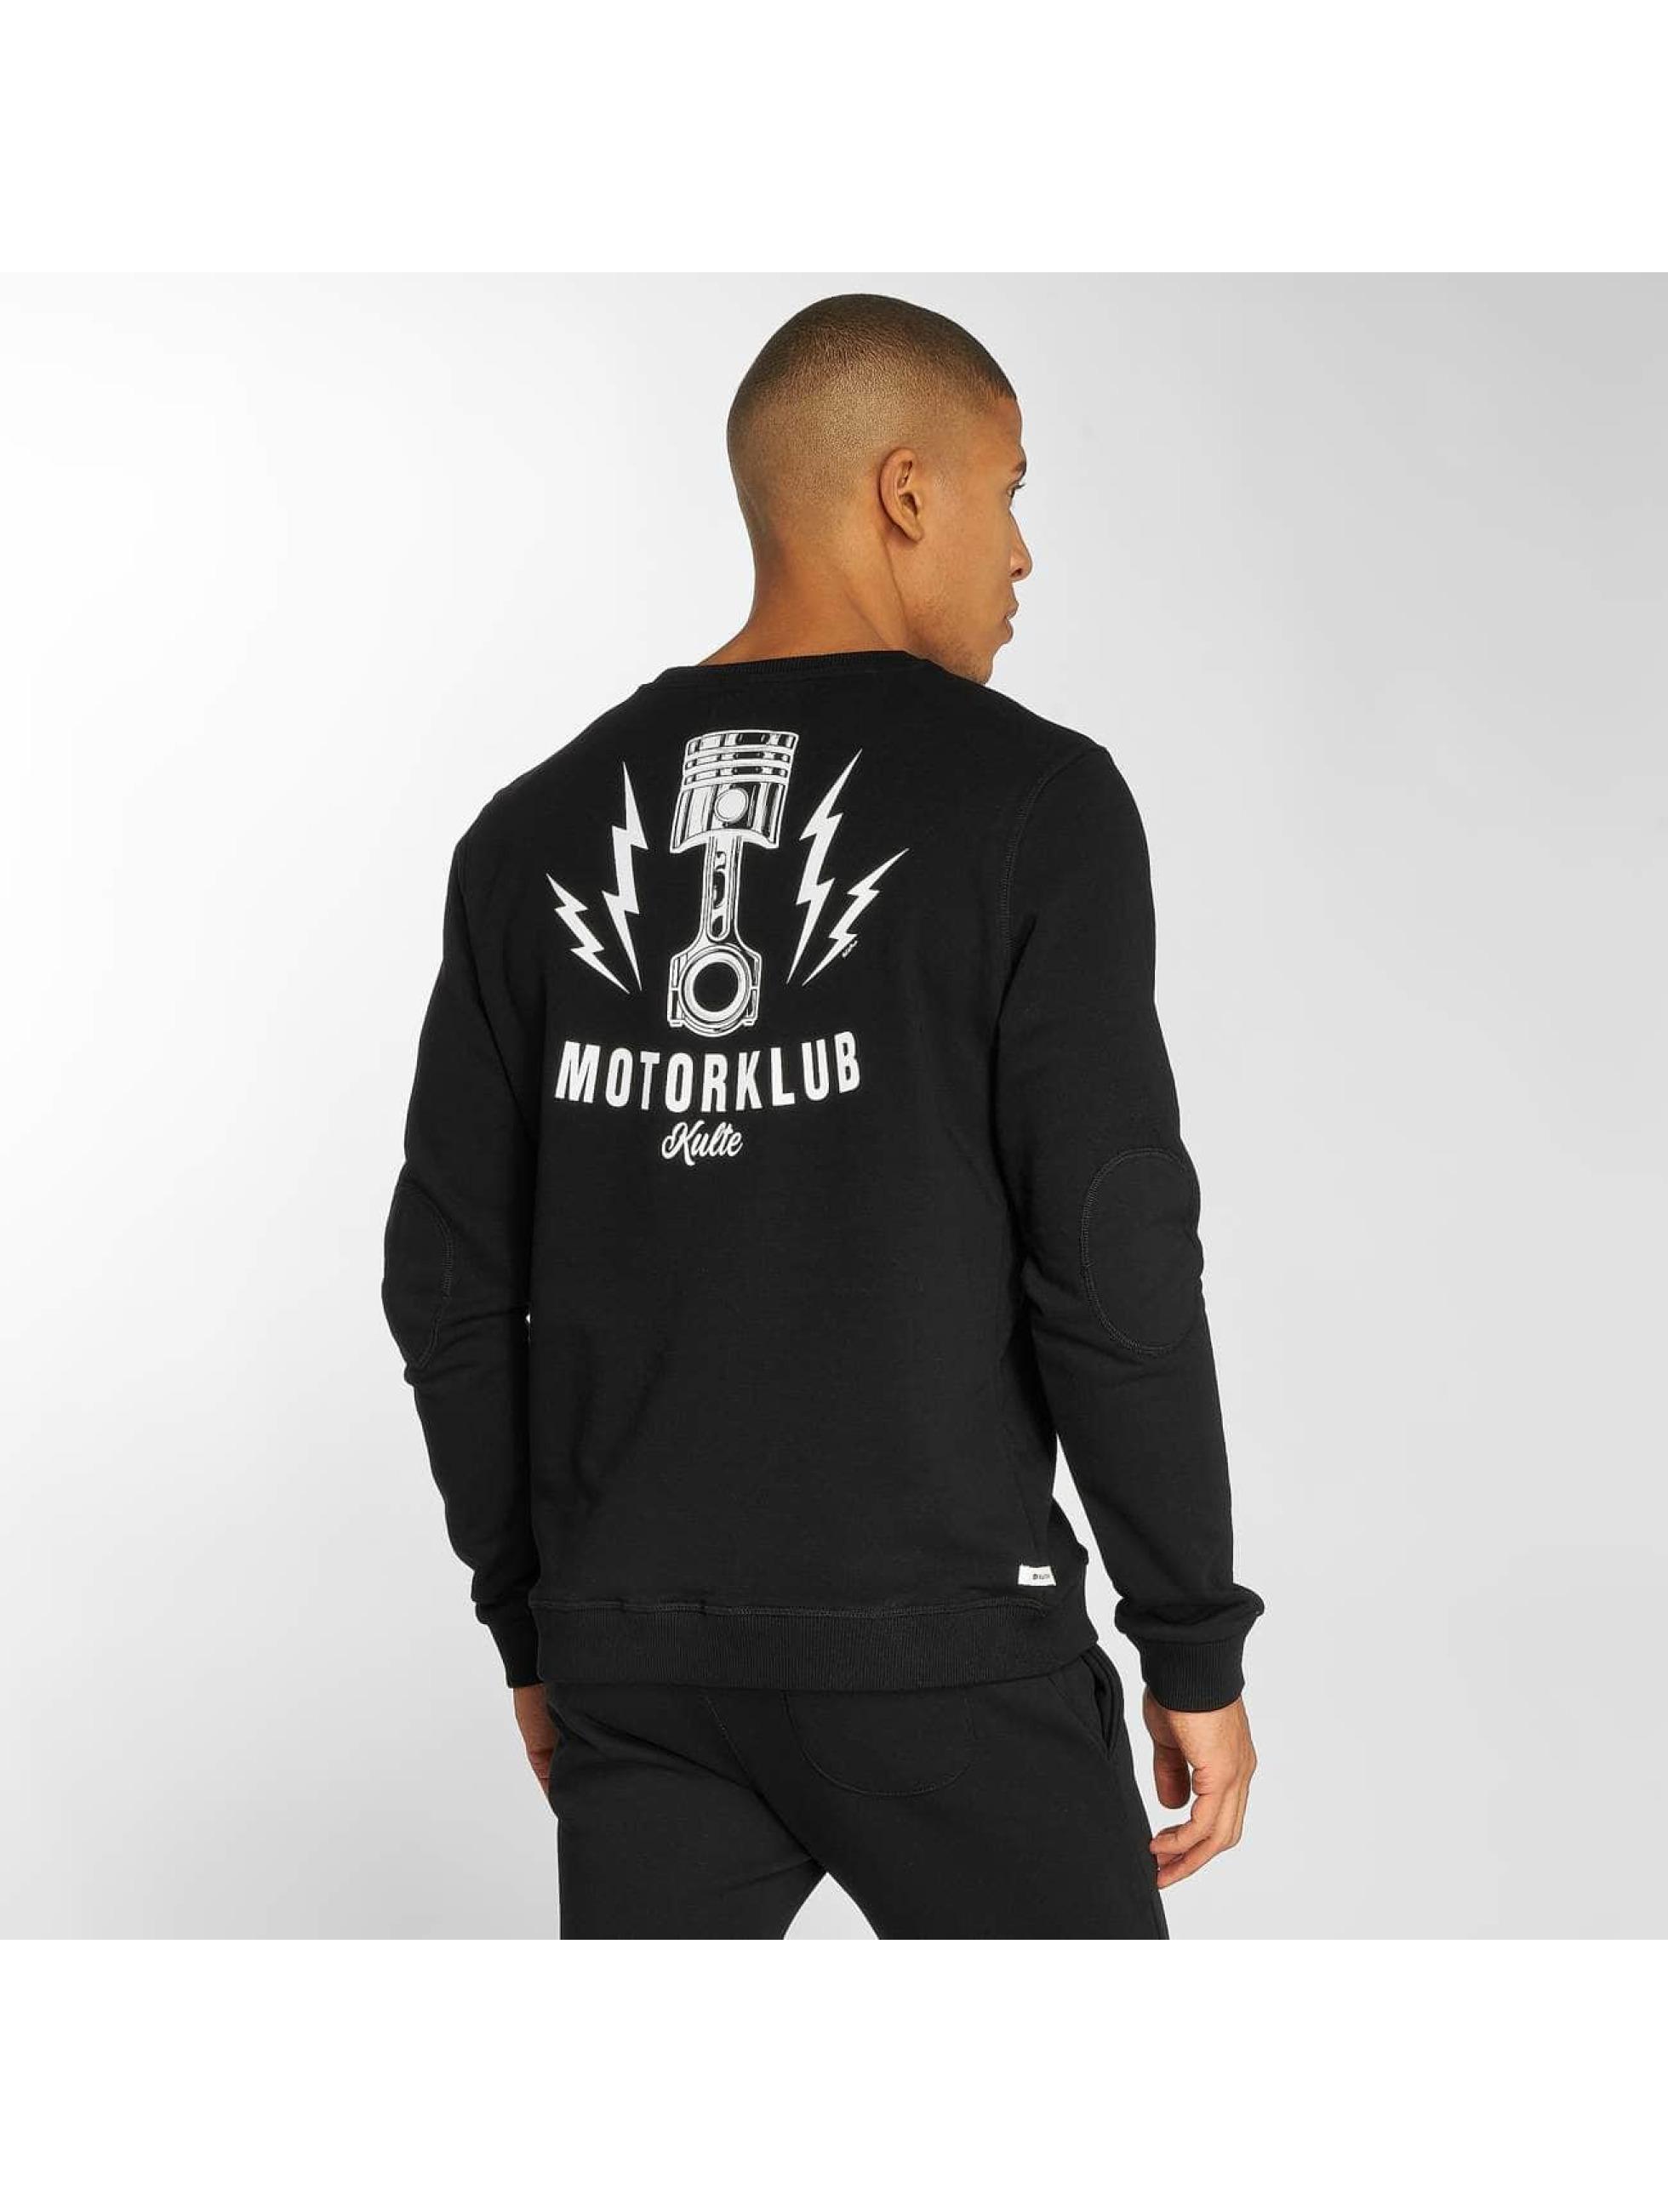 Kulte Pullover Motorklub black